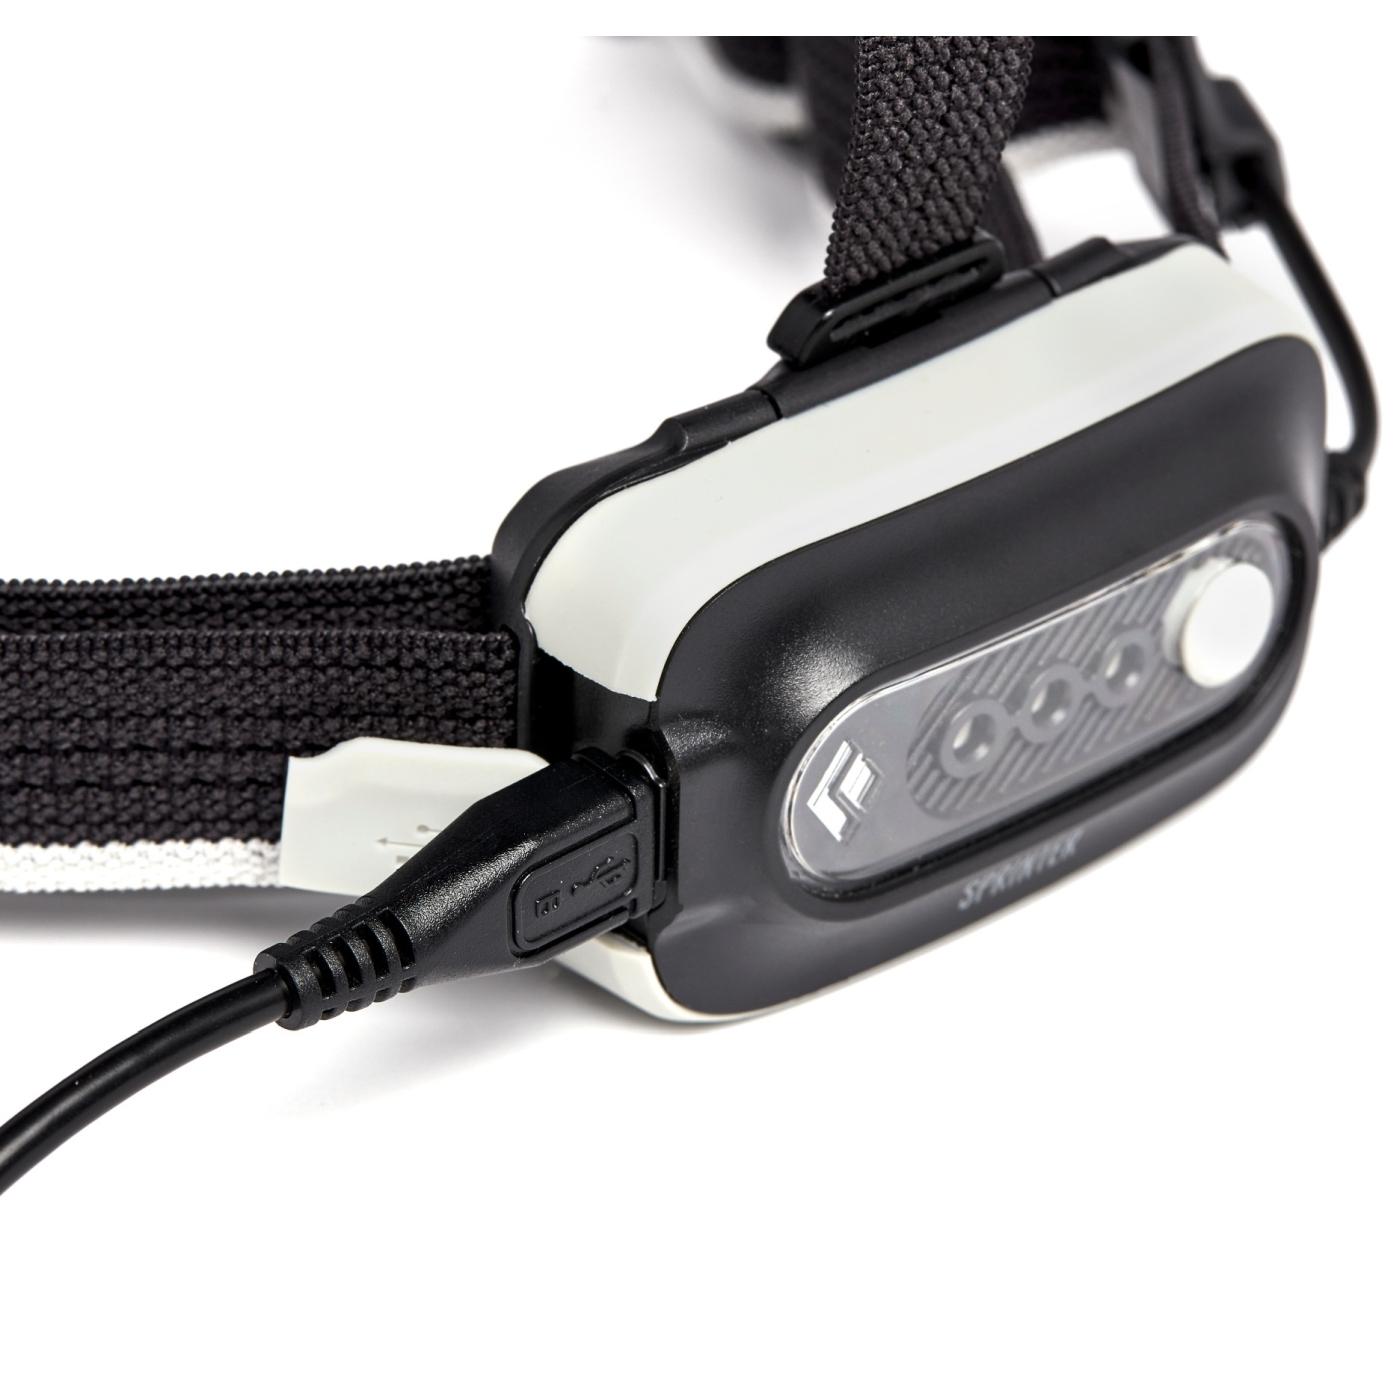 Image of Black Diamond Sprinter 275 Headlamp - Aluminum